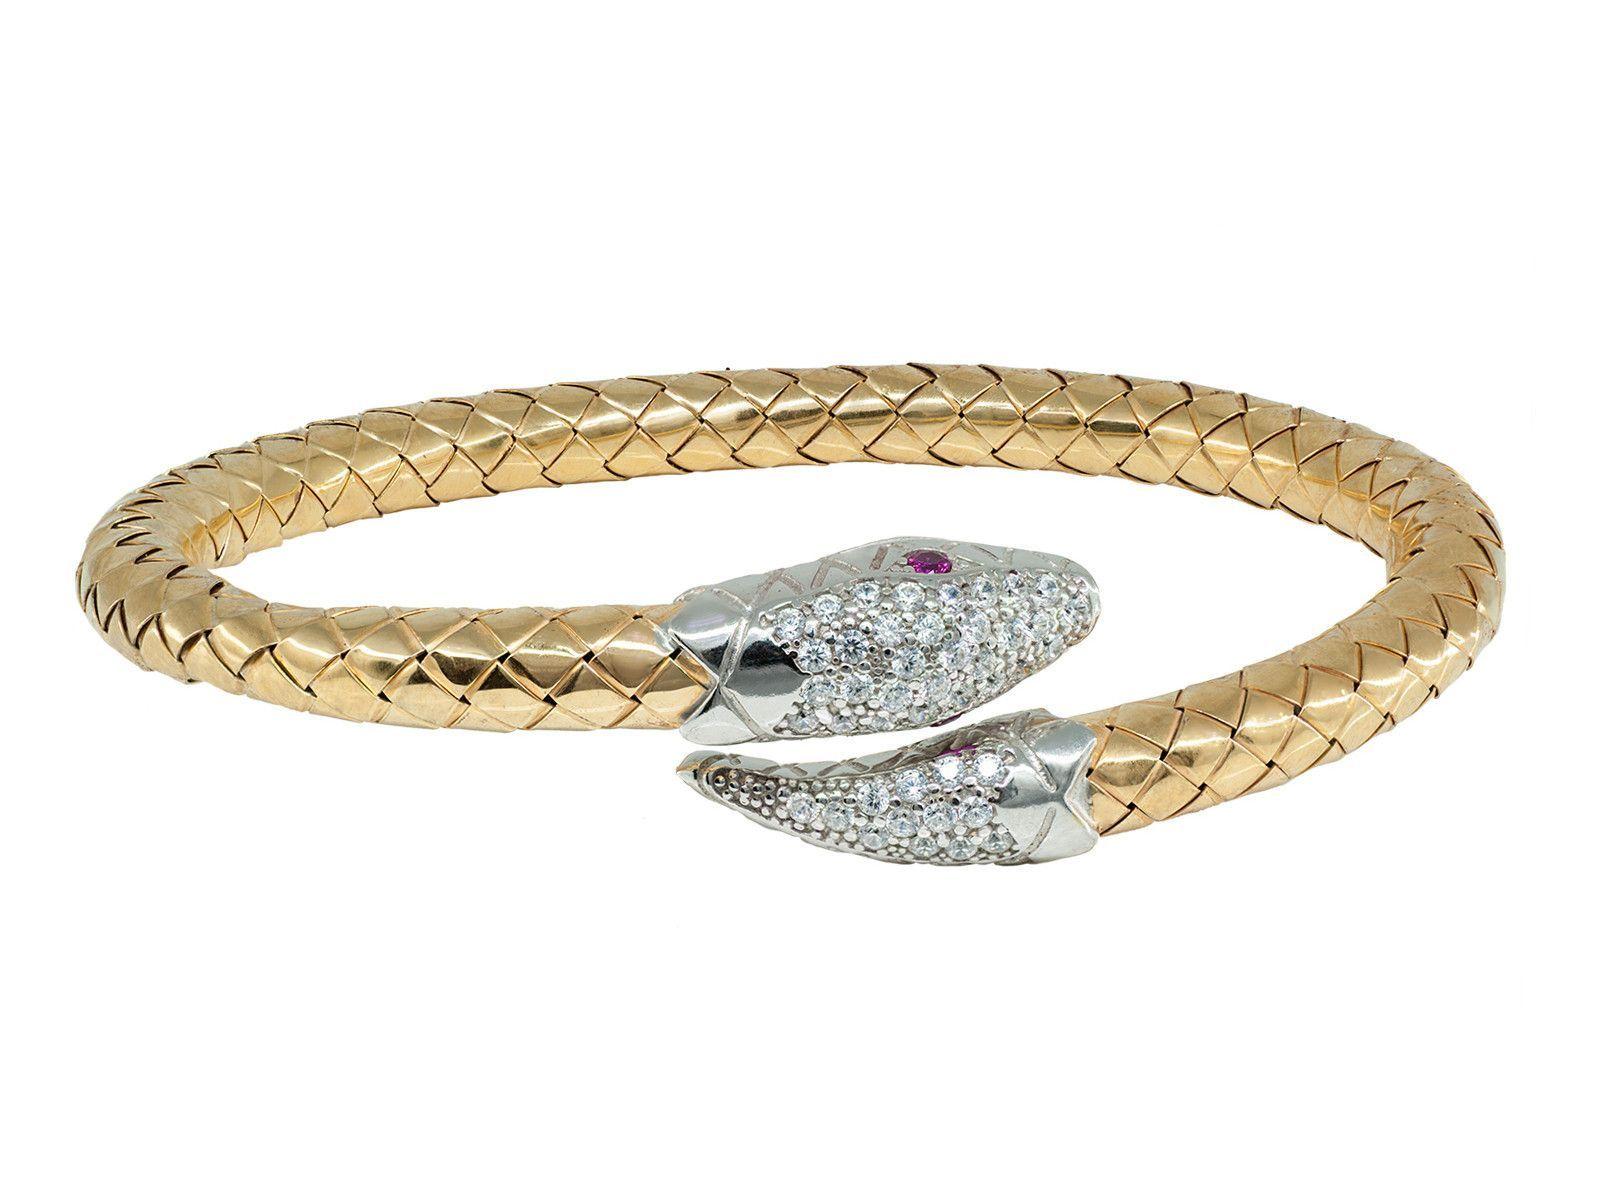 Thick spiga design cz snake head bangle bracelet felxible gold